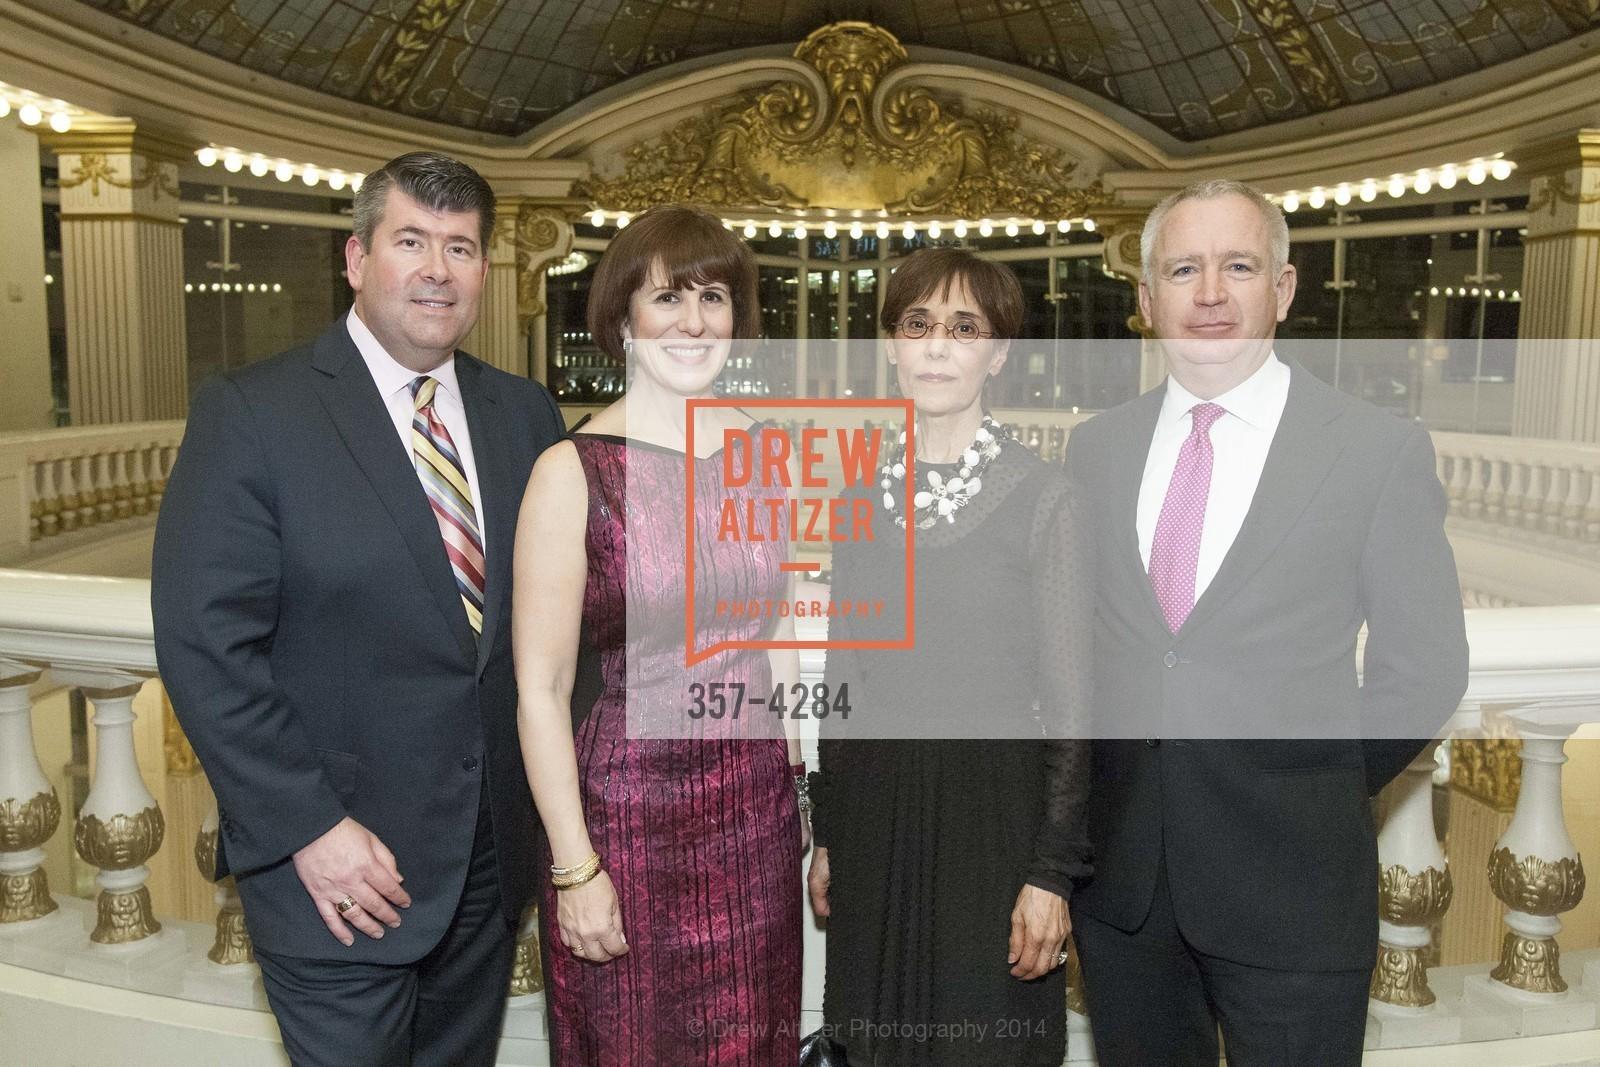 Alan Morrell, Terri Mino, Beatrice Wood, Glenn McCoy, Photo #357-4284